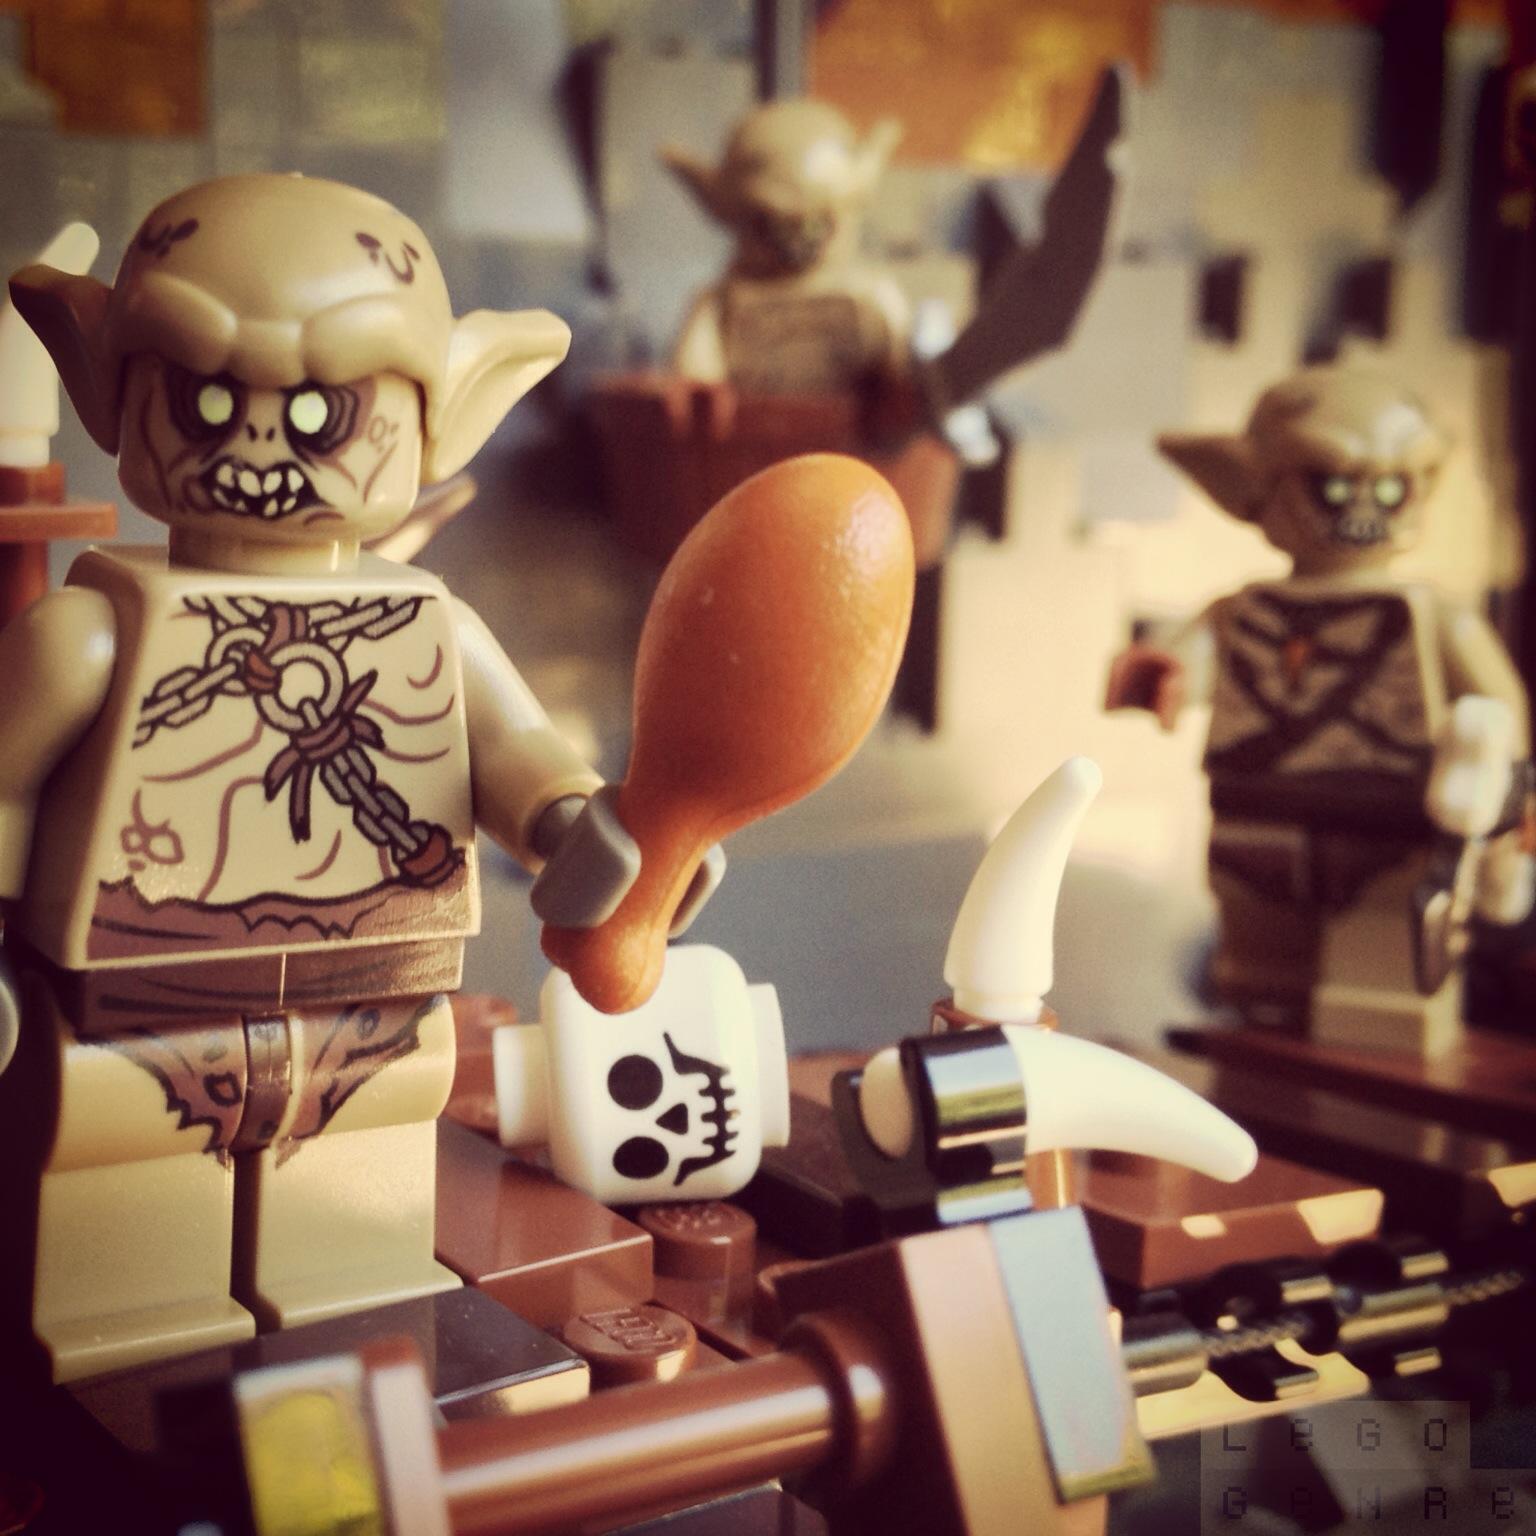 LegoGenre: Goblinz